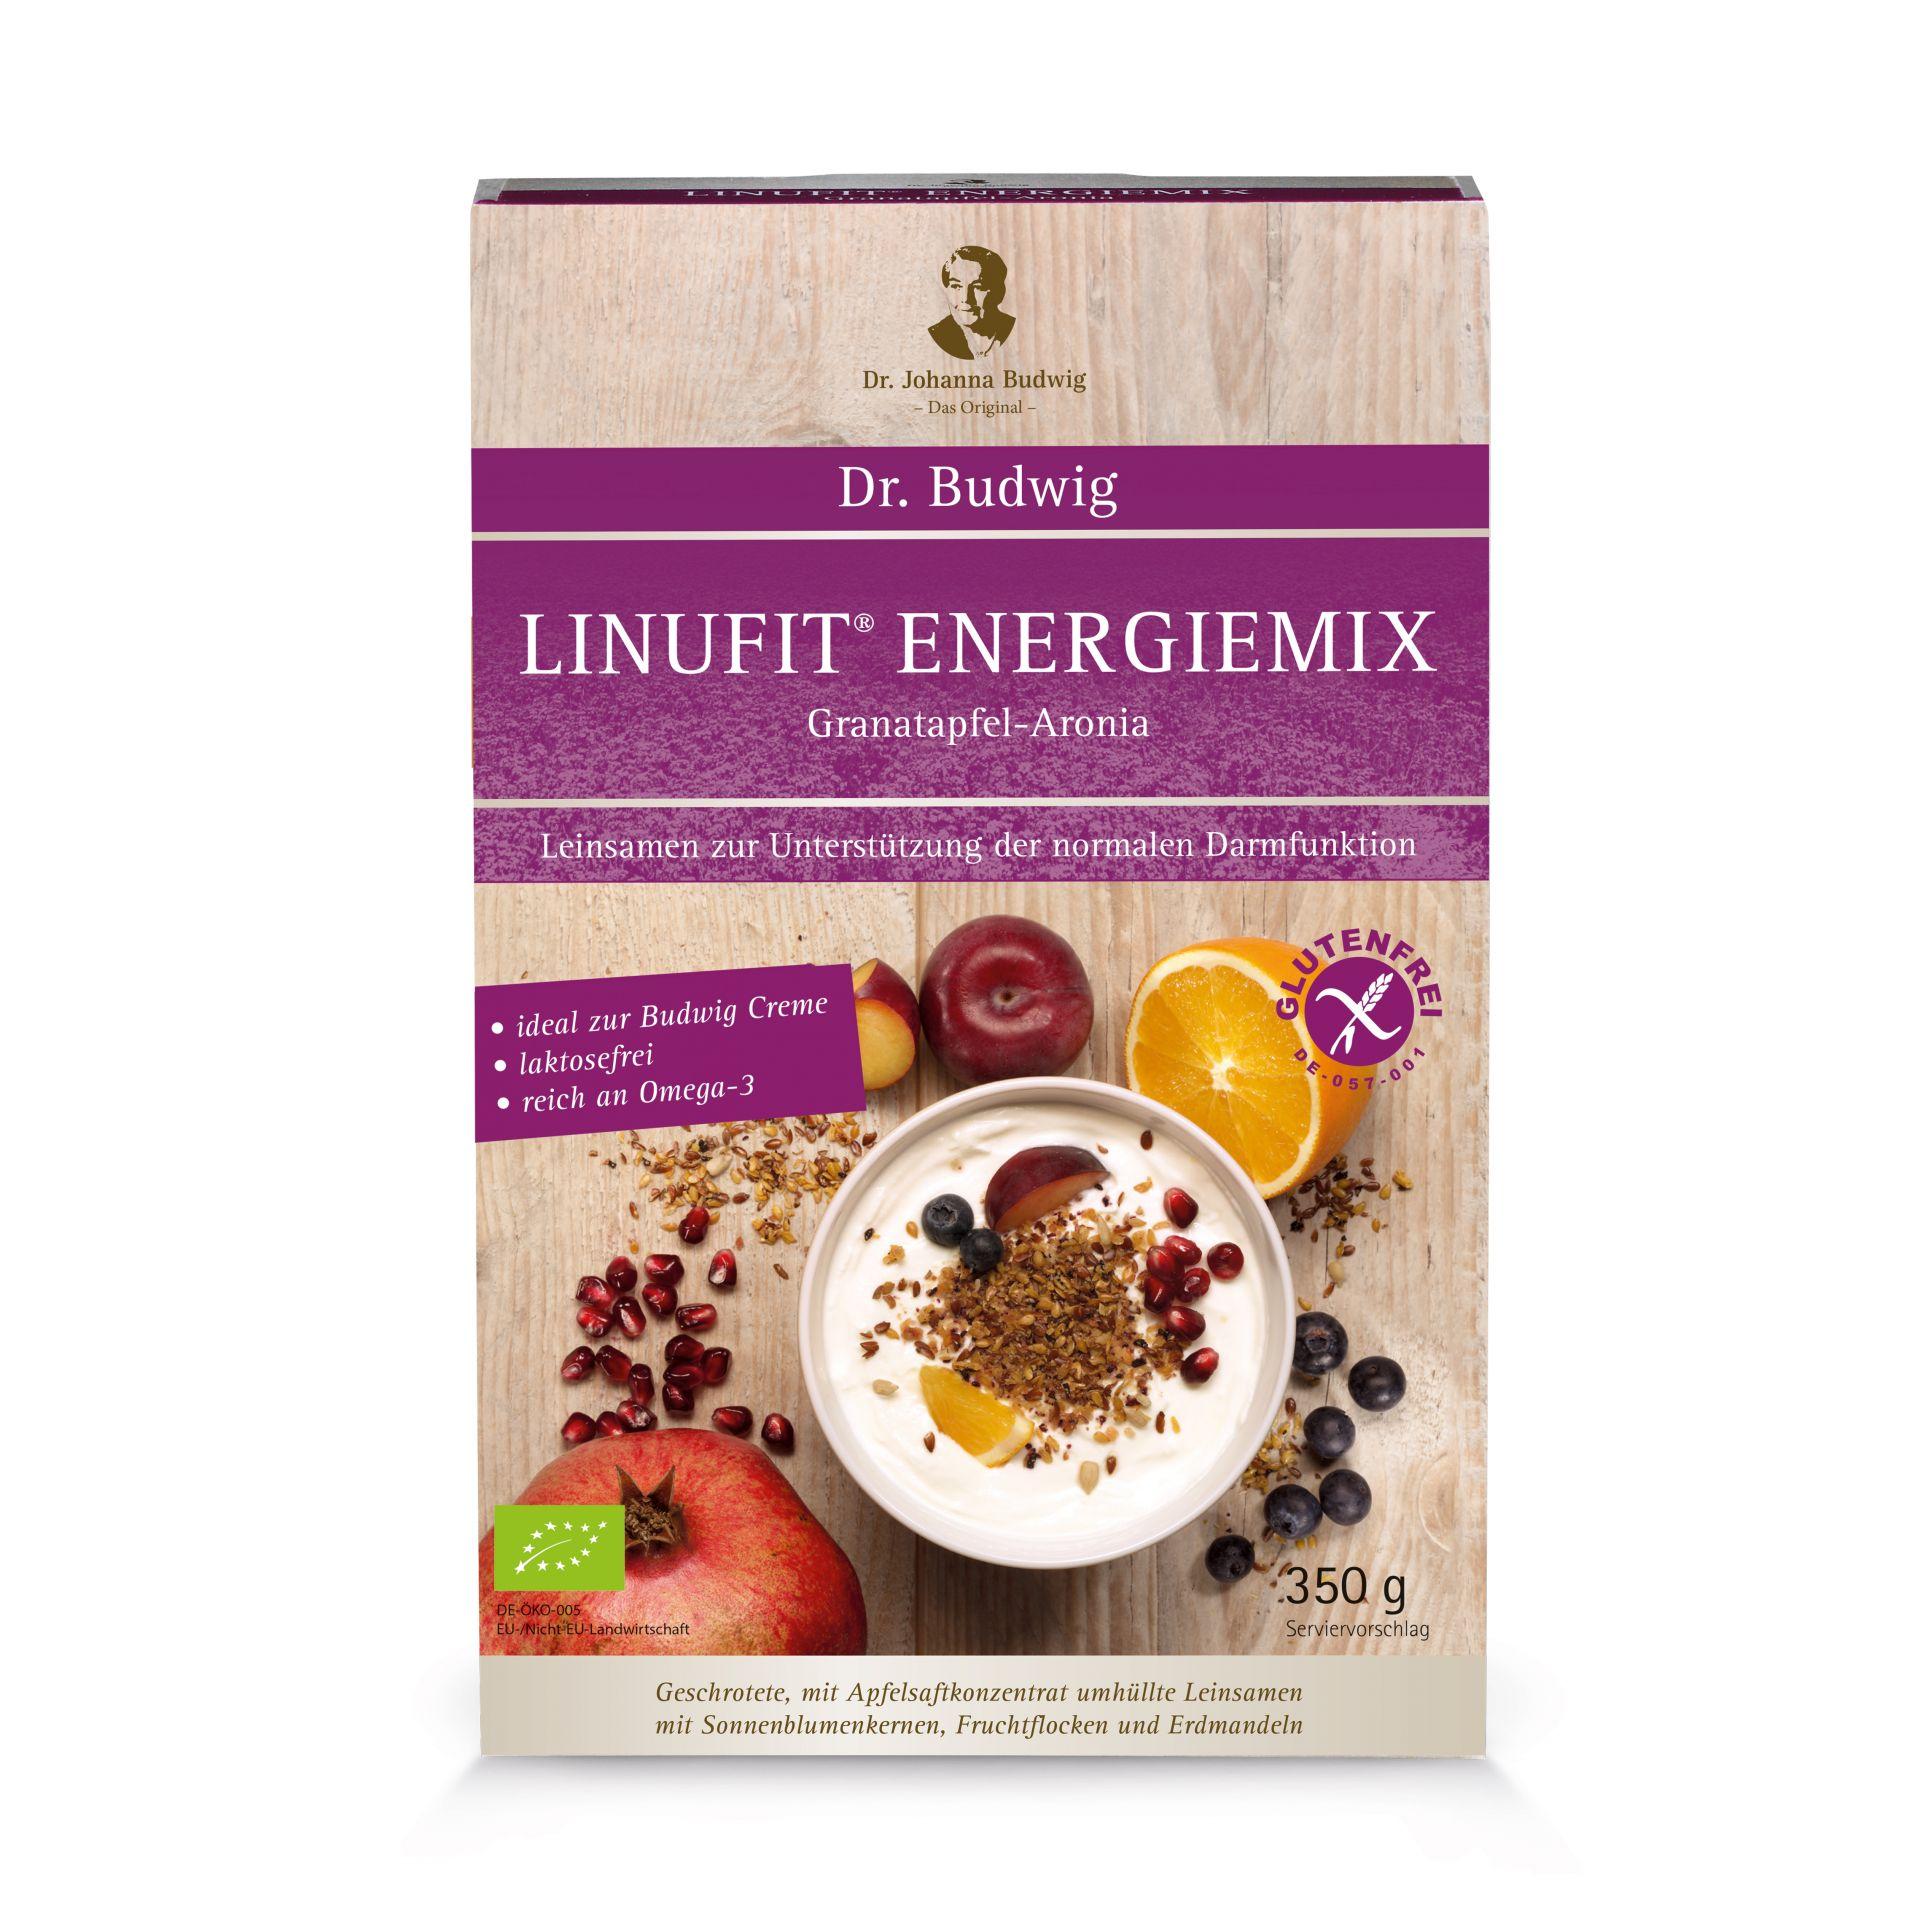 Dr. Budwig Linufit Energiemix Granatapfel-Aronia